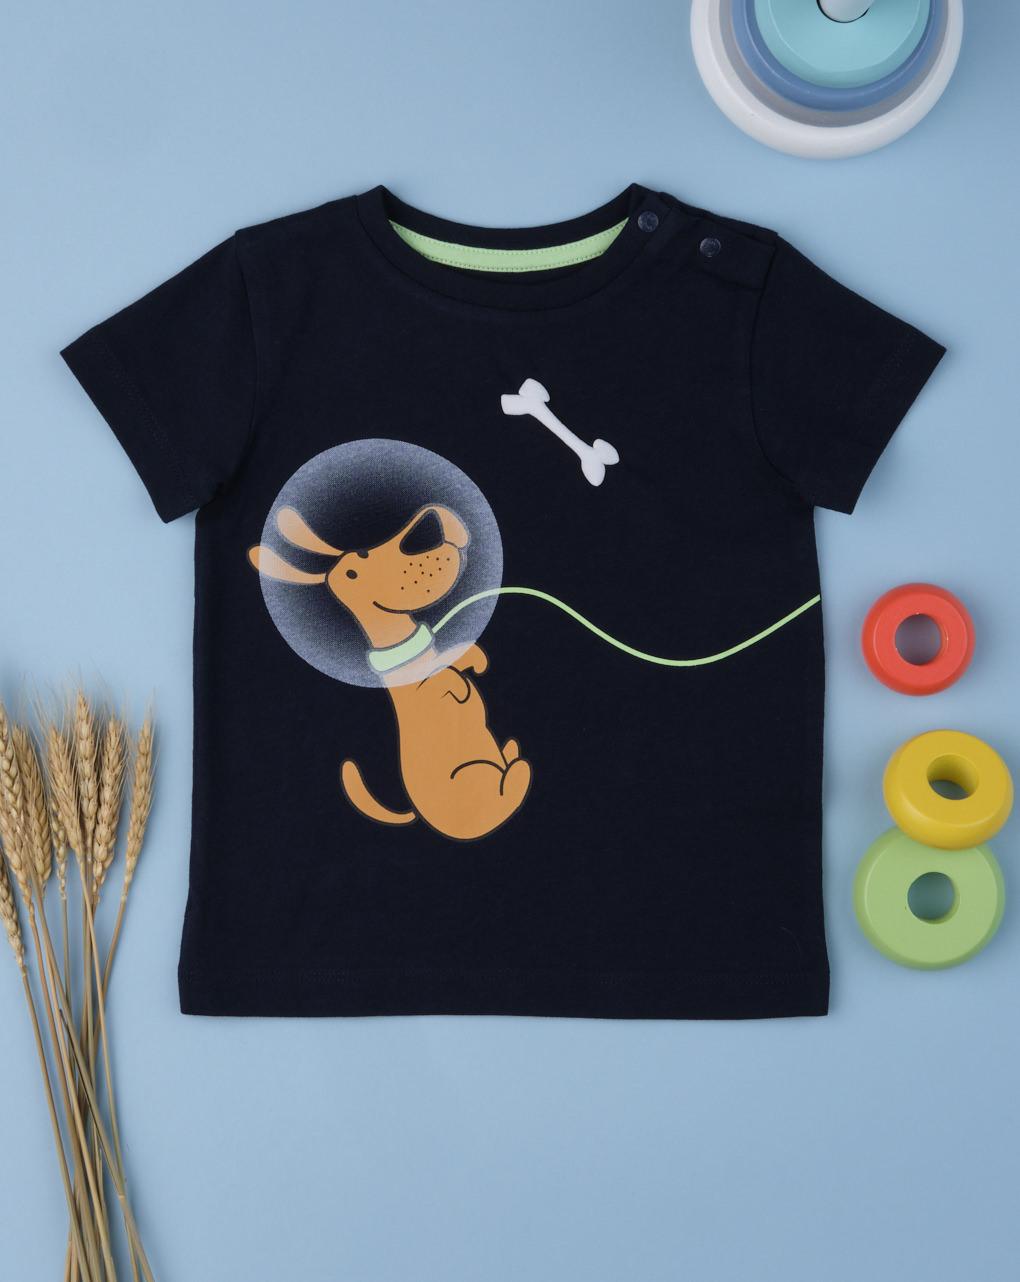 T-shirt με Σκύλο Αστροναύτη για Αγόρι